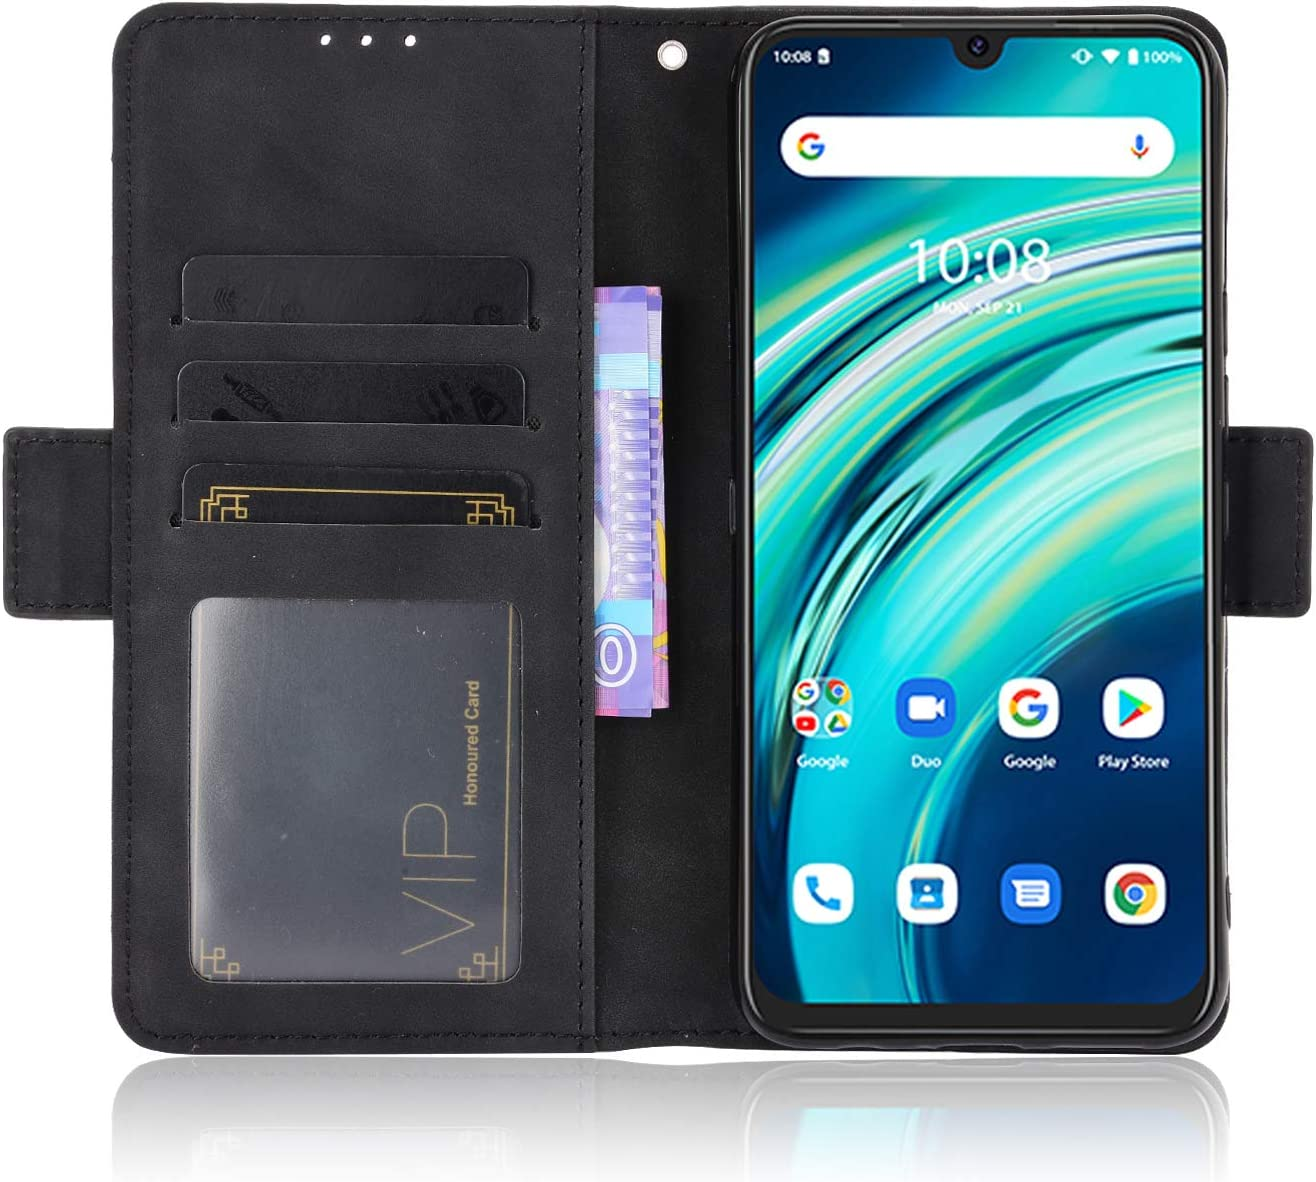 UMIDIGI A9 Pro, Blue Card Slots Magnetic Closure Kickstand Shockproof PU Leather Flip Case for UMIDIGI A9 Pro UMIDIGI A9 Pro Wallet Case